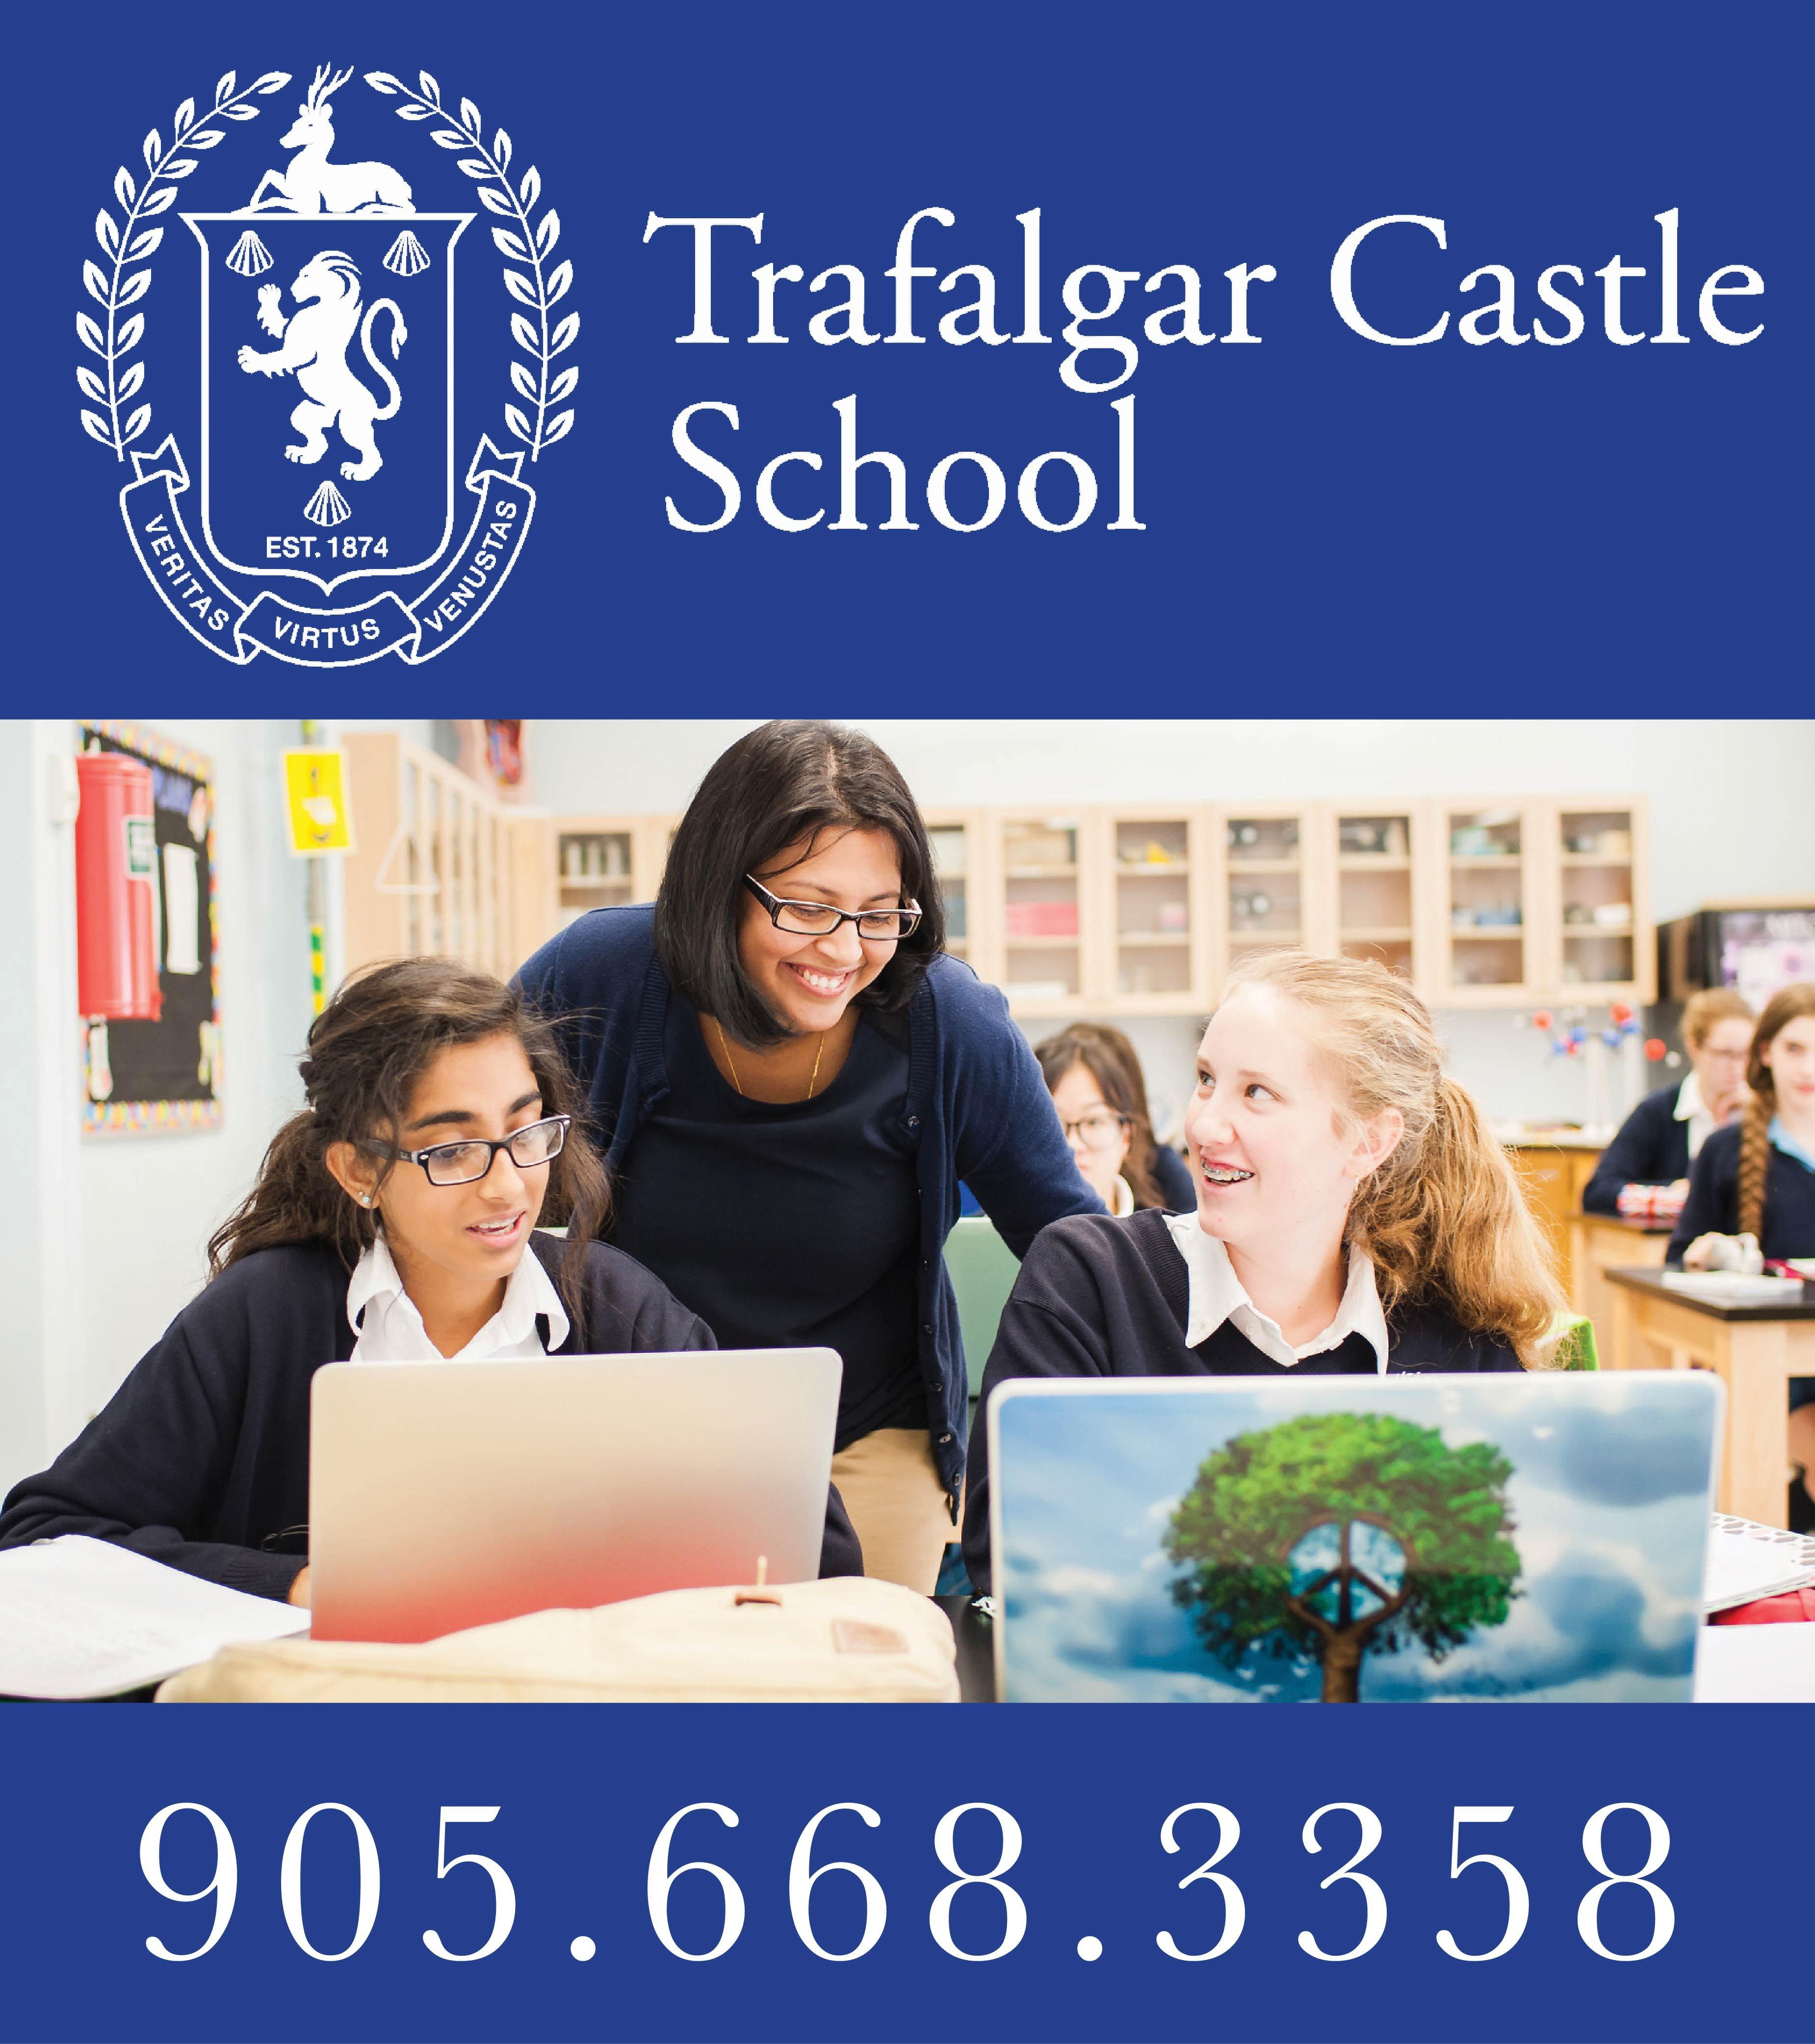 Trafalgar Castle